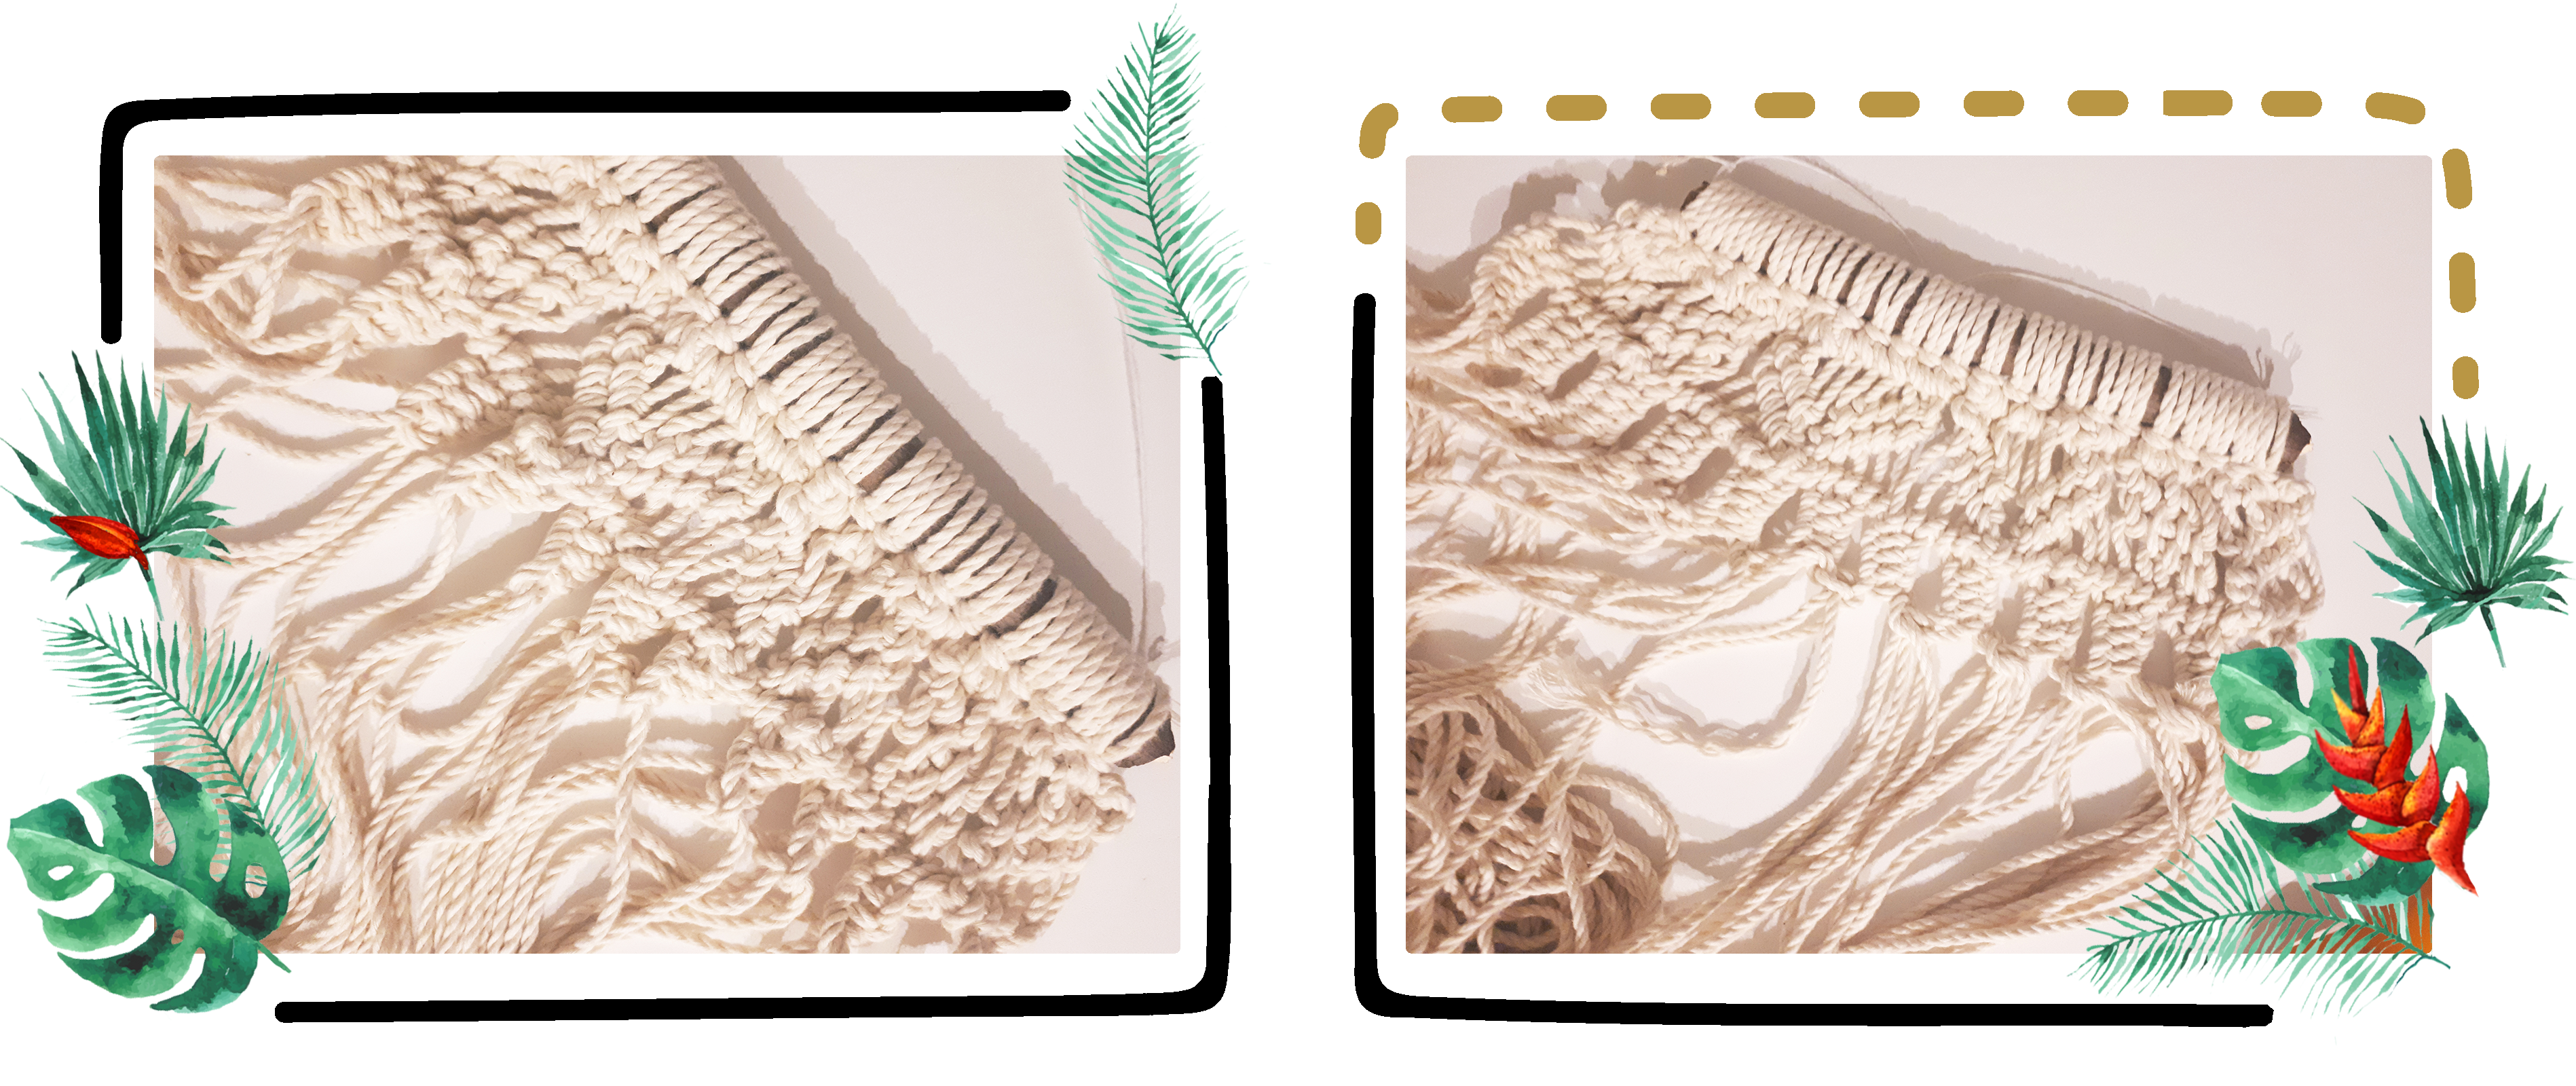 DIY-decoration-murale-macrame-etape-7-8-Cactus-and-Style